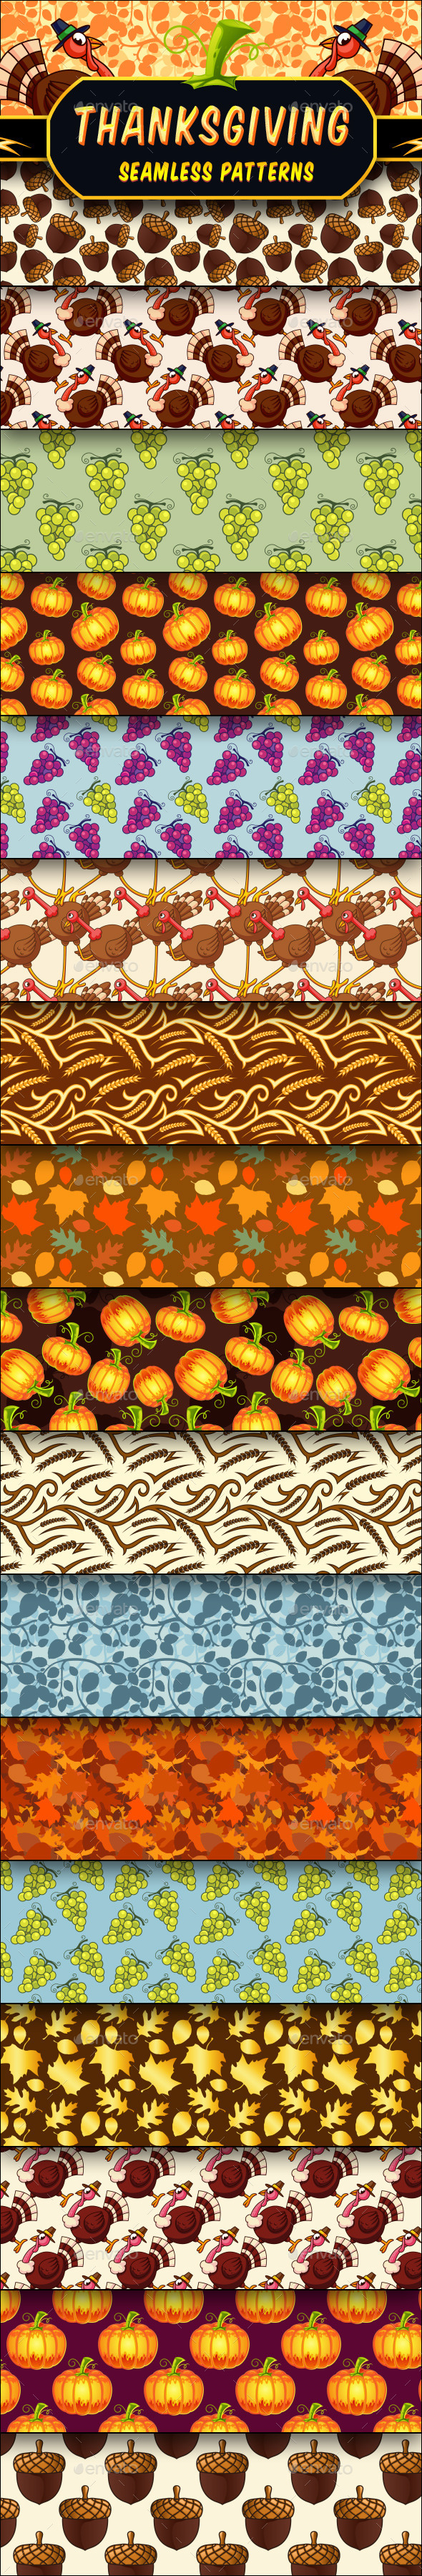 Thanksgiving Seamless Patterns Set - Seasons/Holidays Conceptual